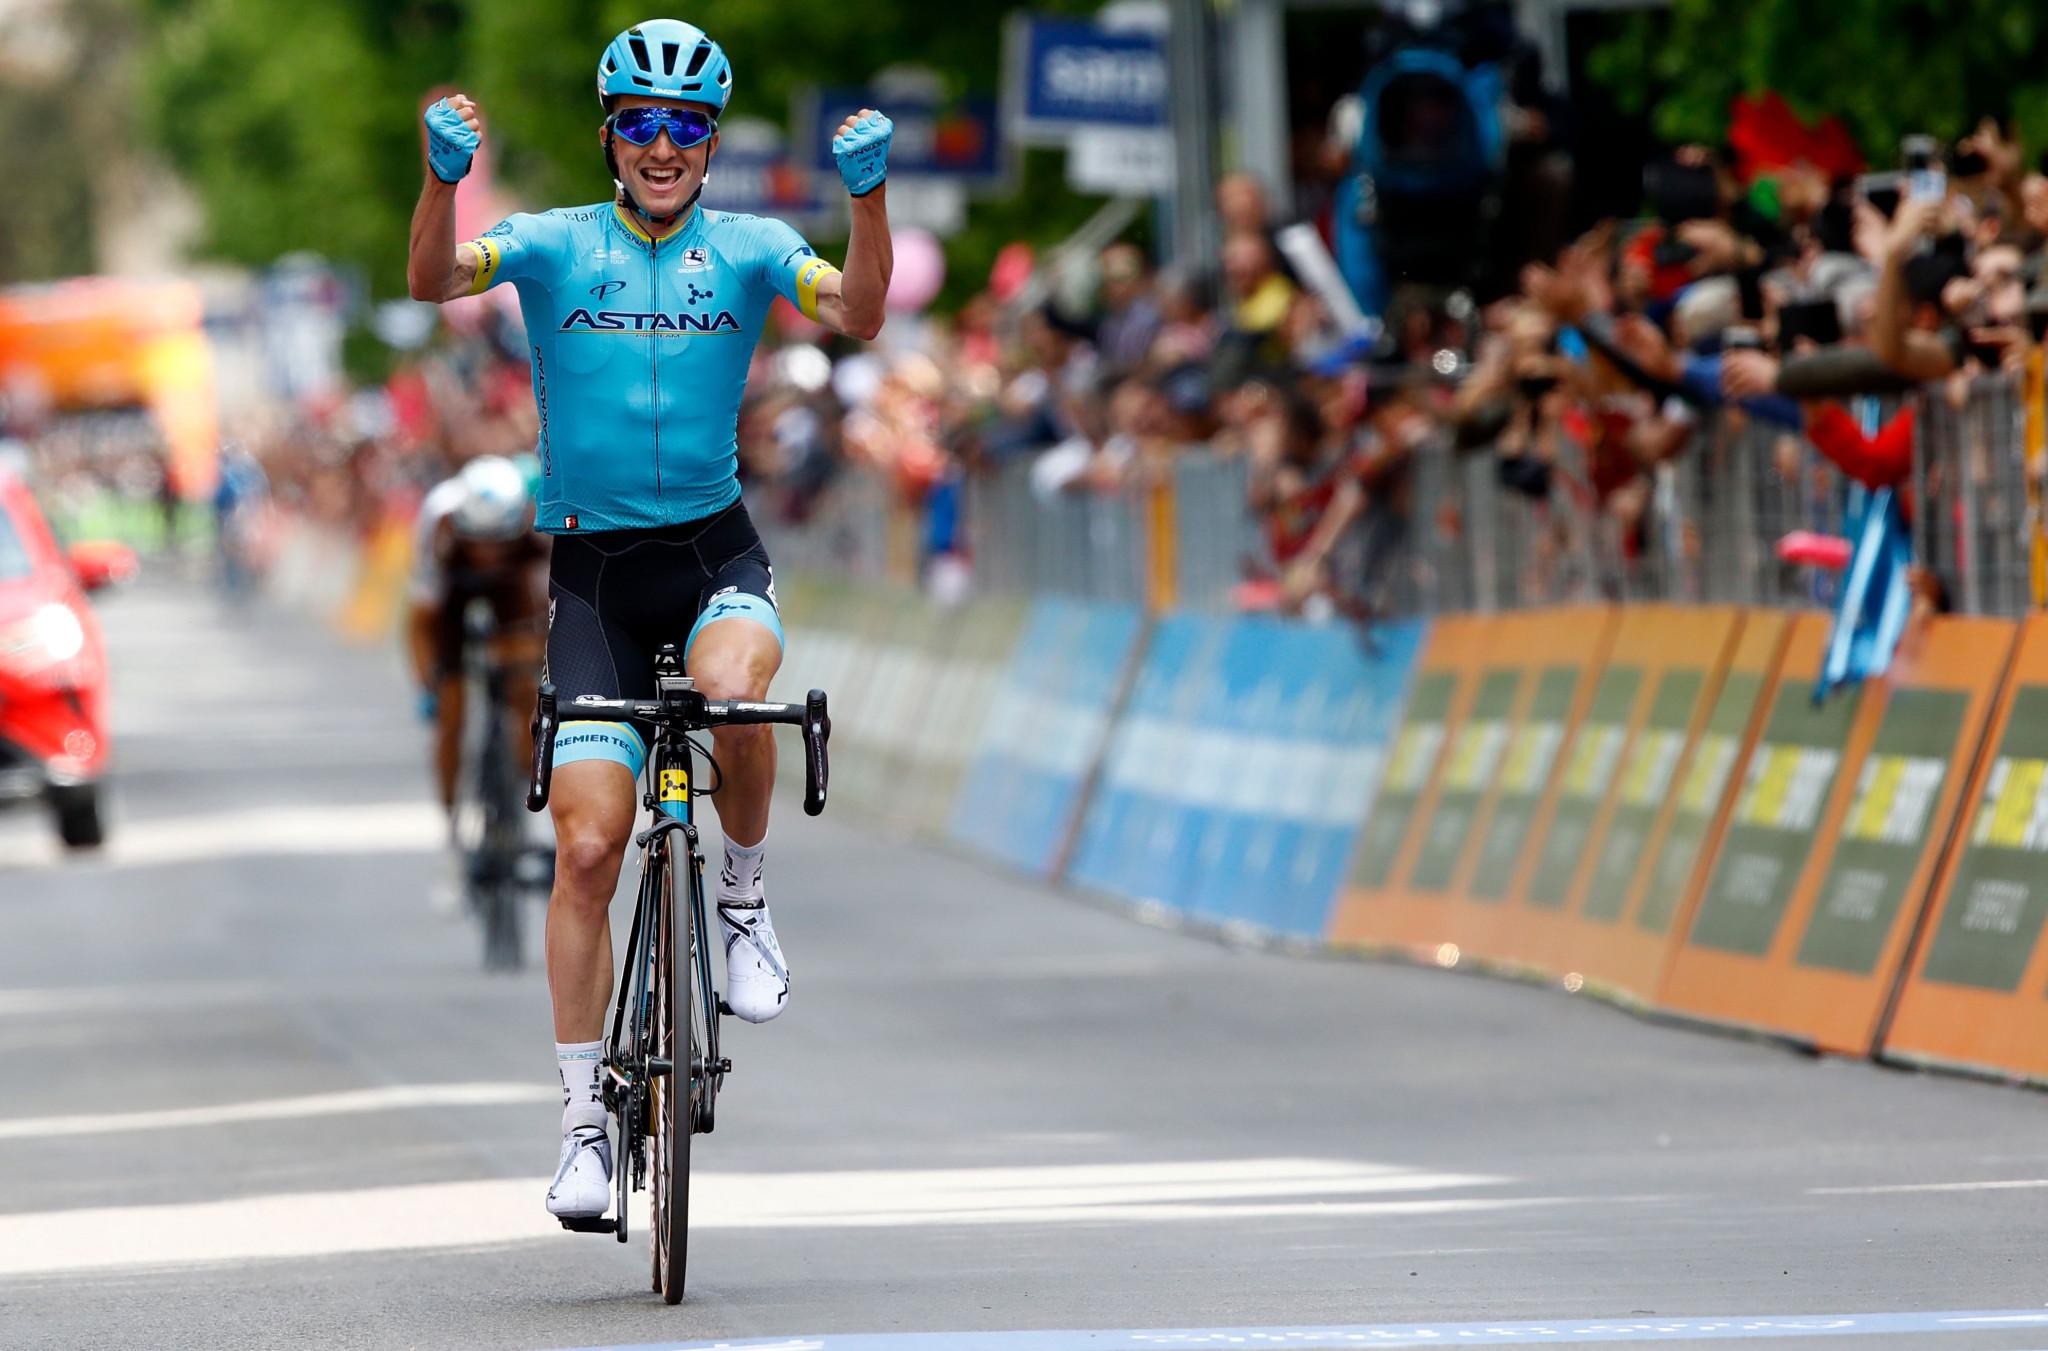 Bilbao wins stage seven of Giro d'Italia as Conti retains overall lead